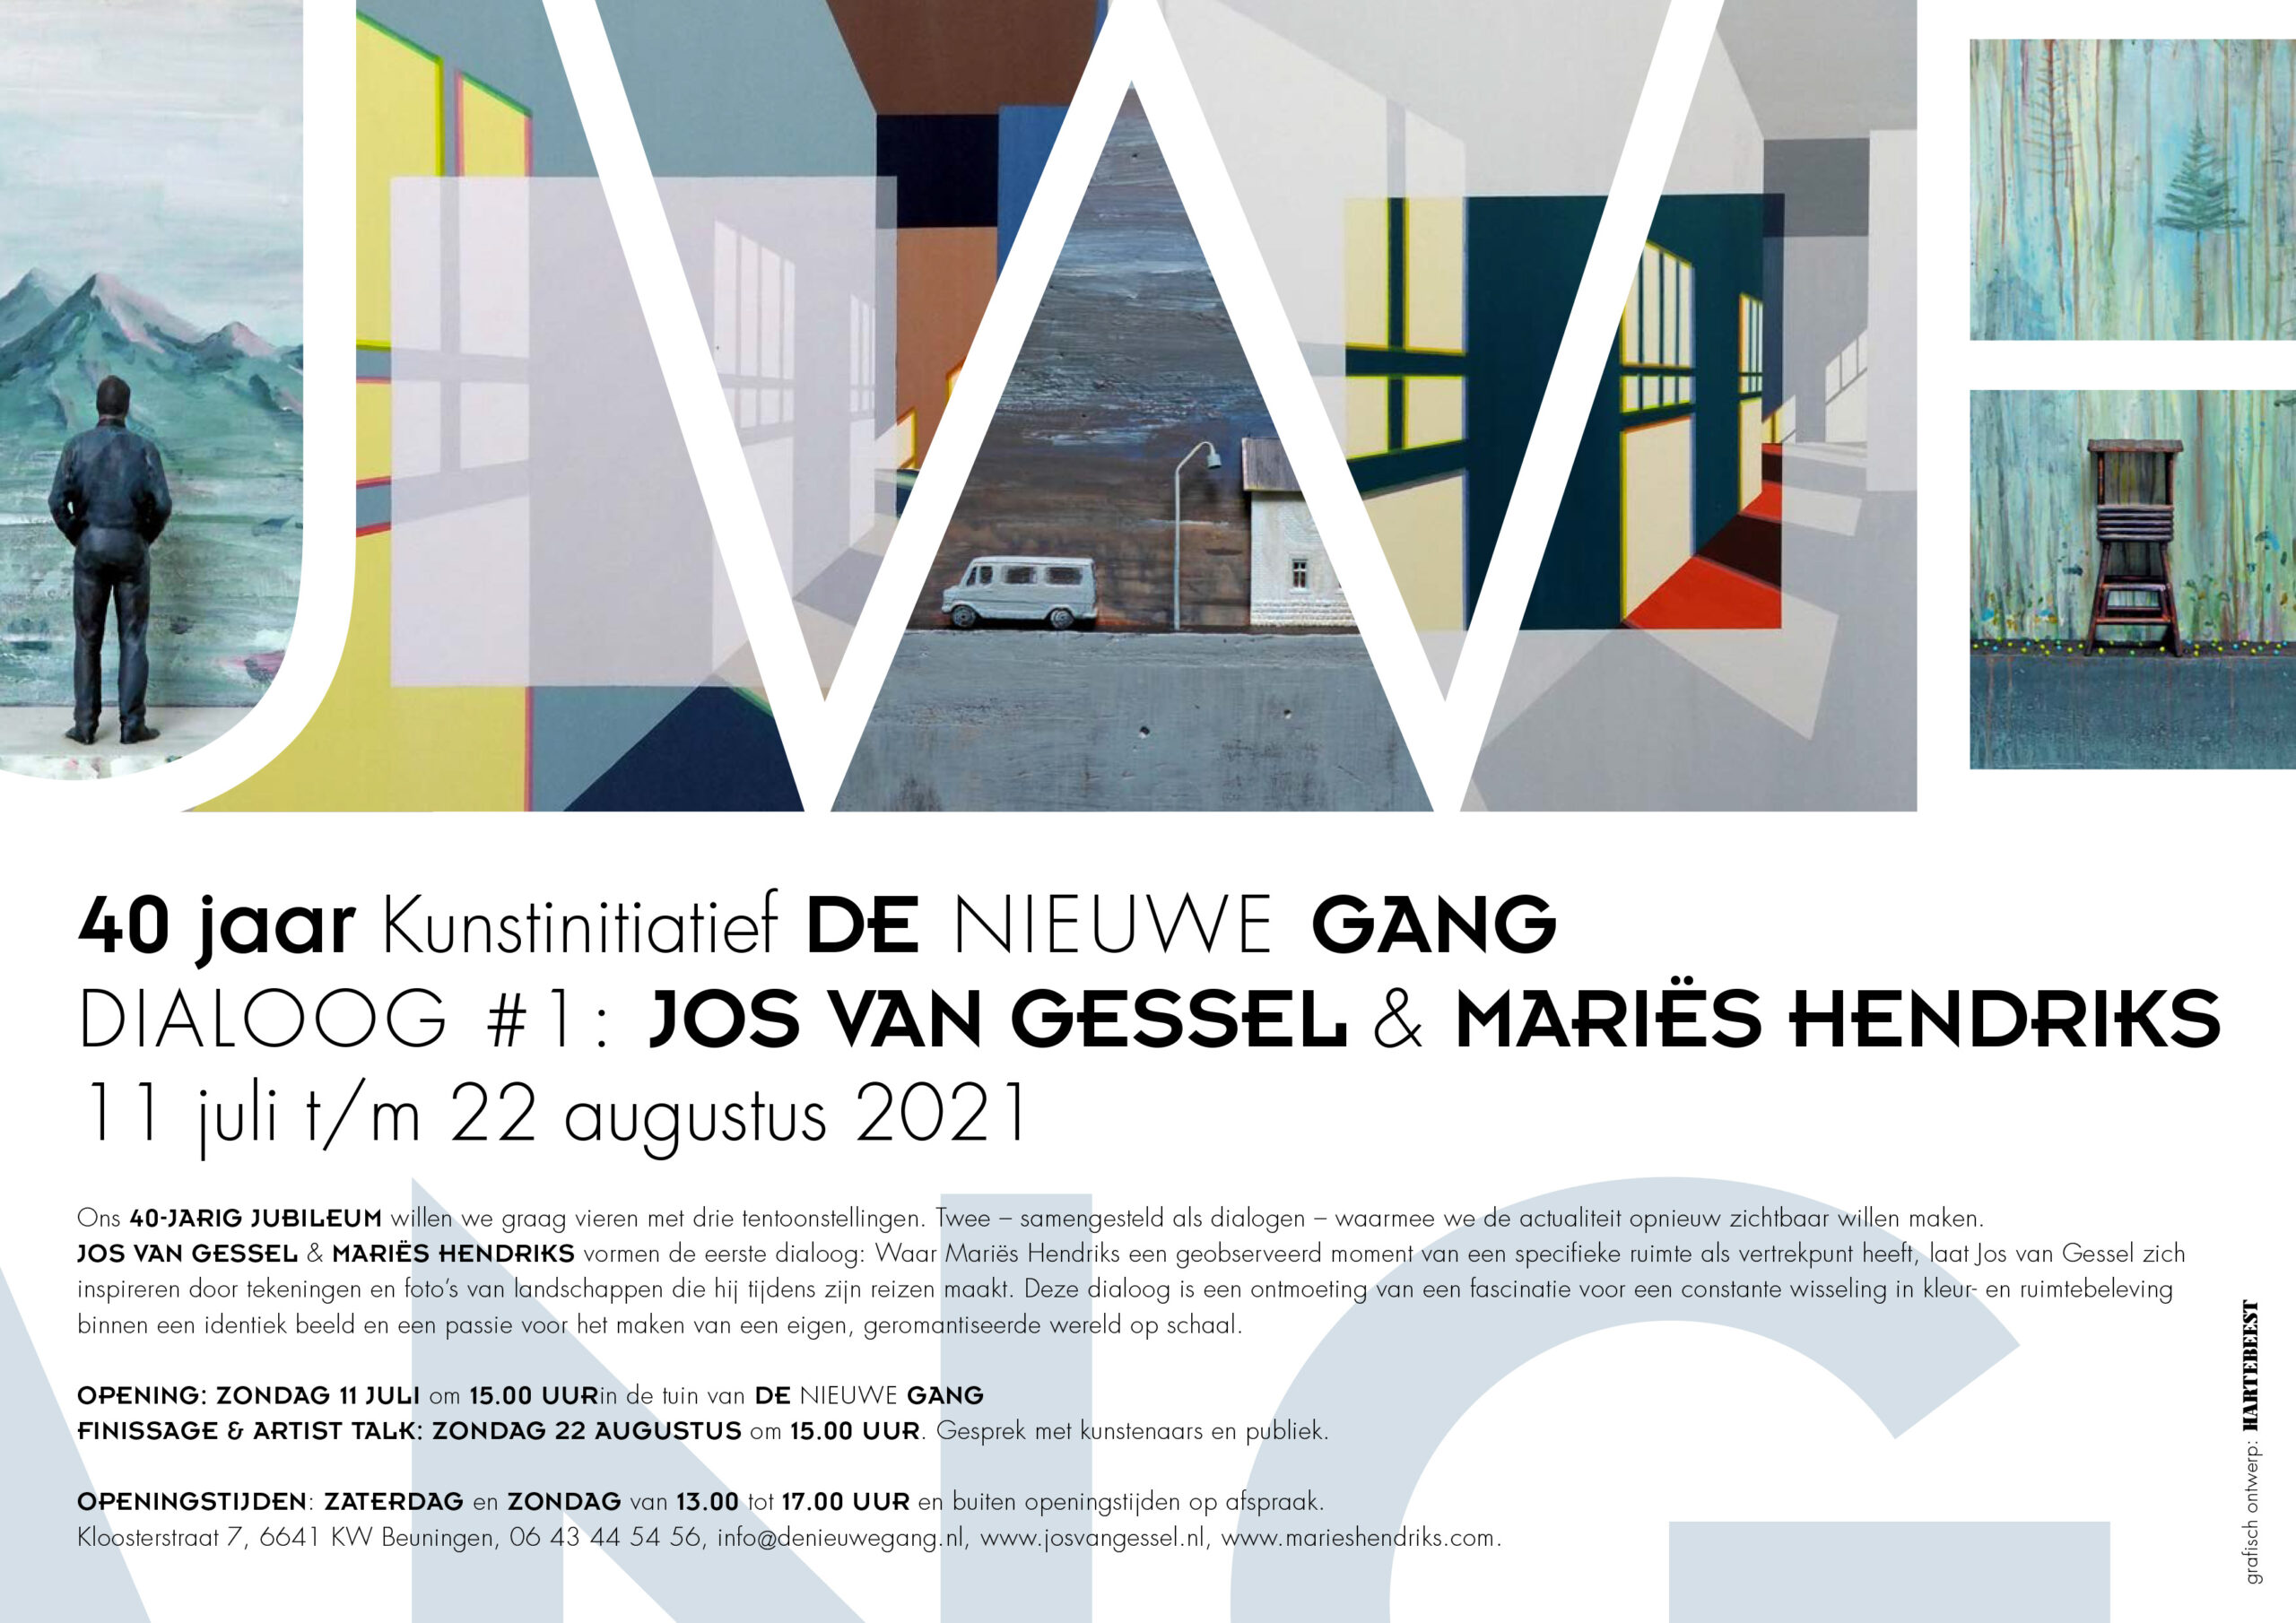 Opening zondag 11 juli om 15:  Dialoog # 1 Jos van Gessel en Mariës Hendriks